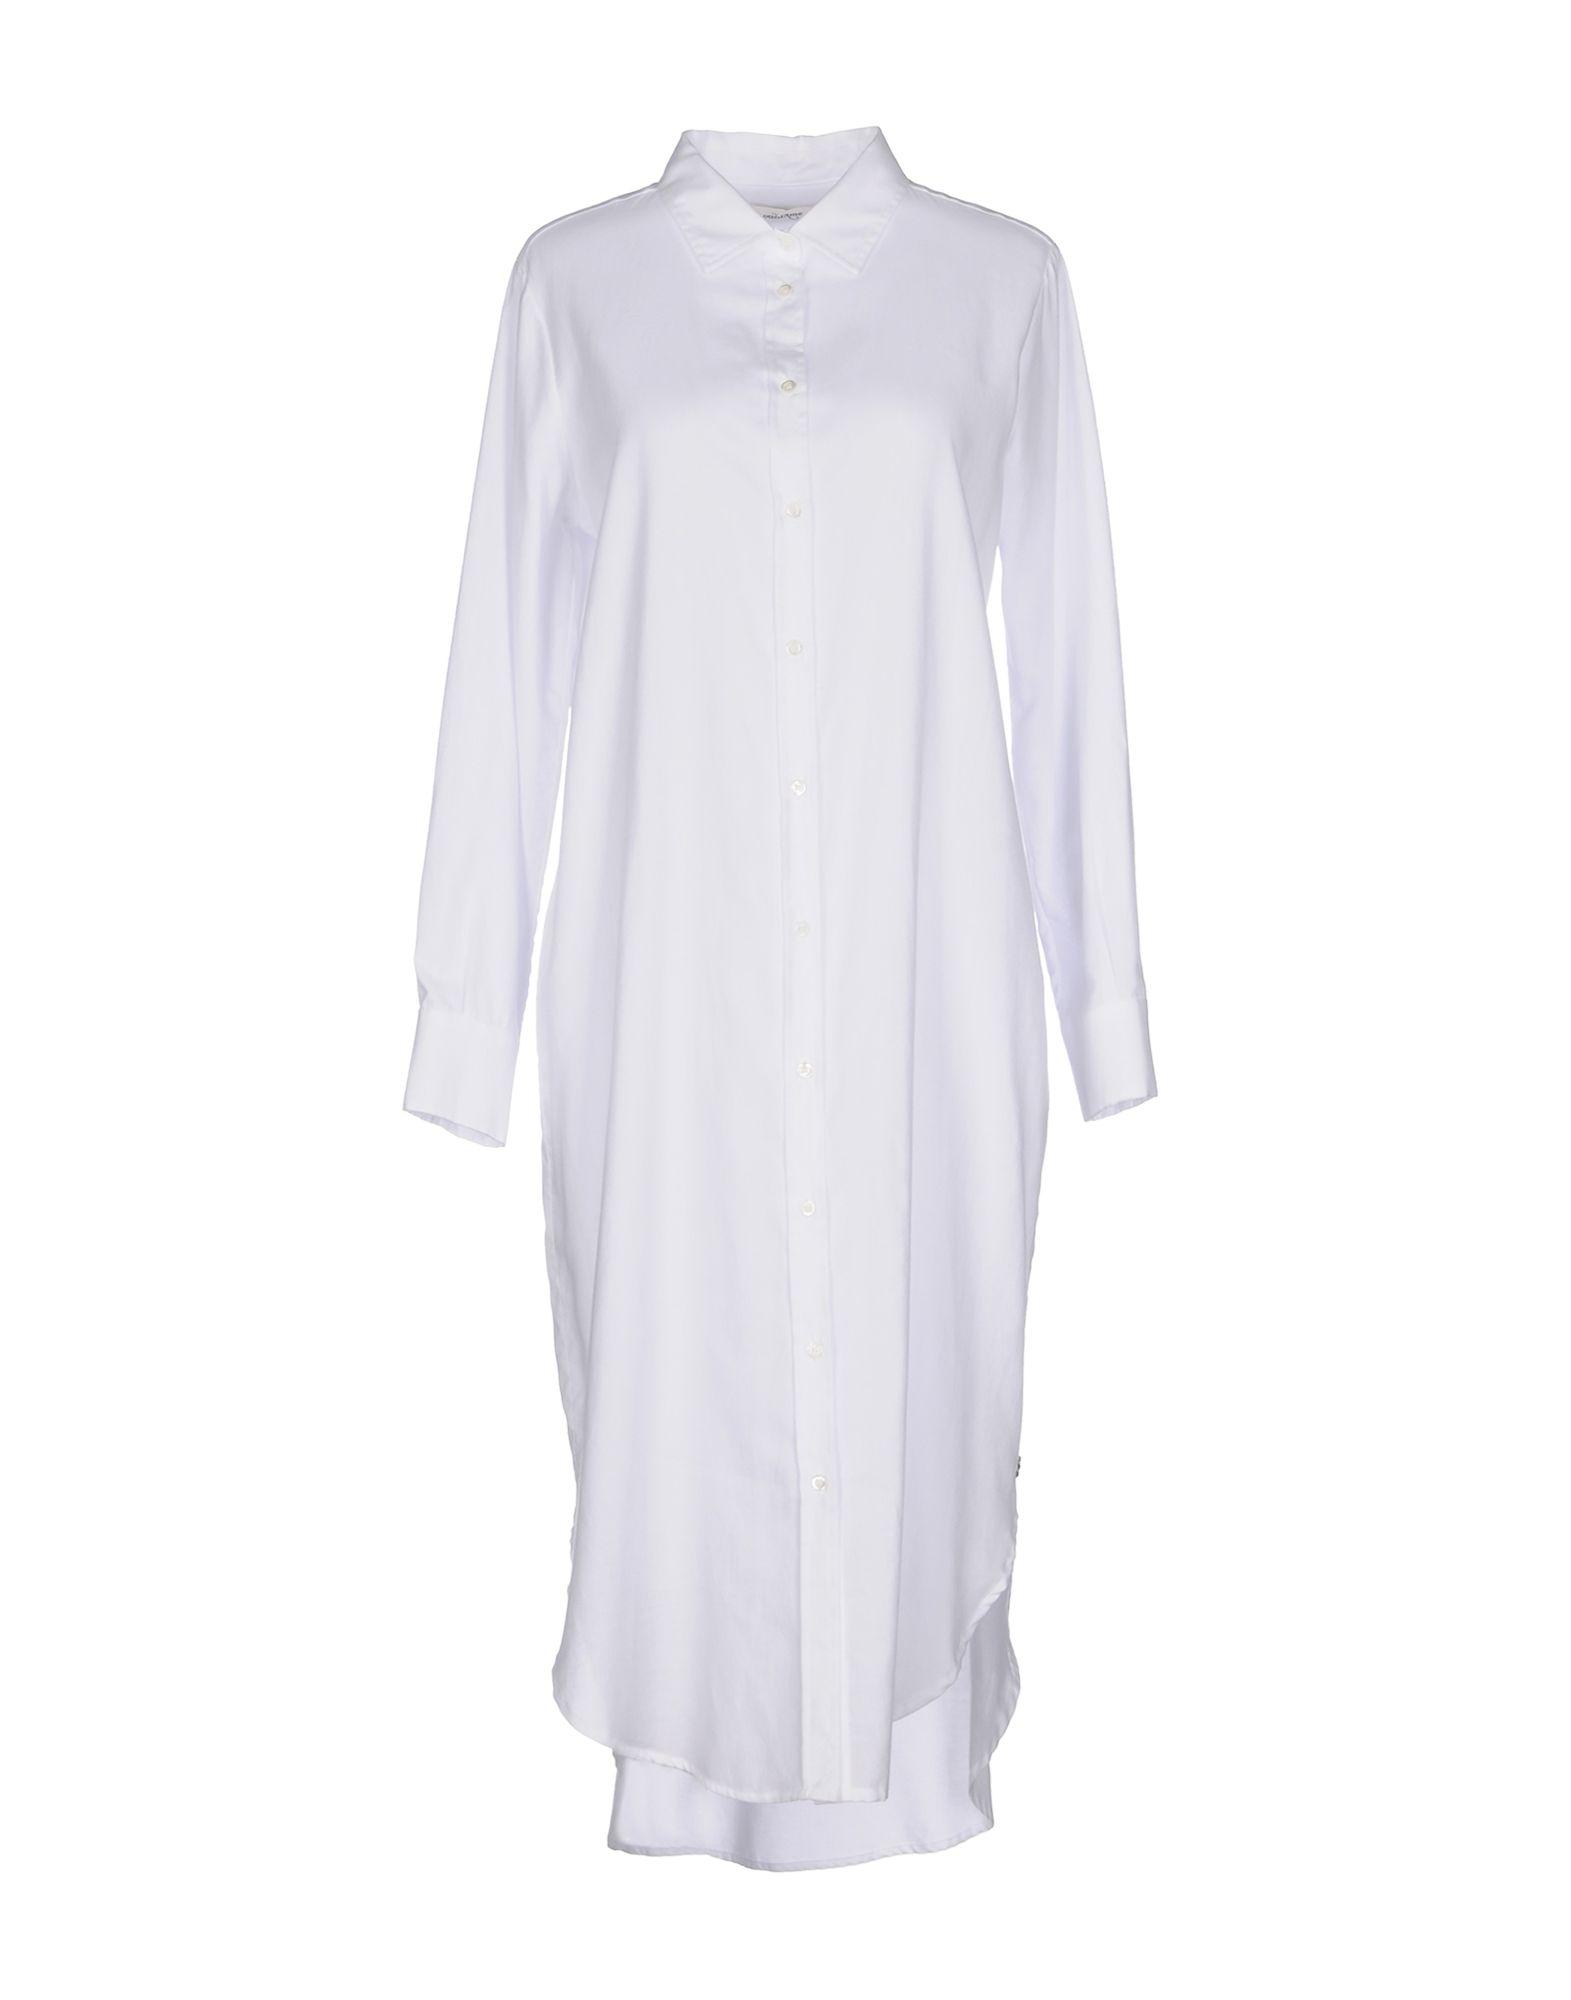 OTTOD'AME Платье до колена sly010 платье до колена